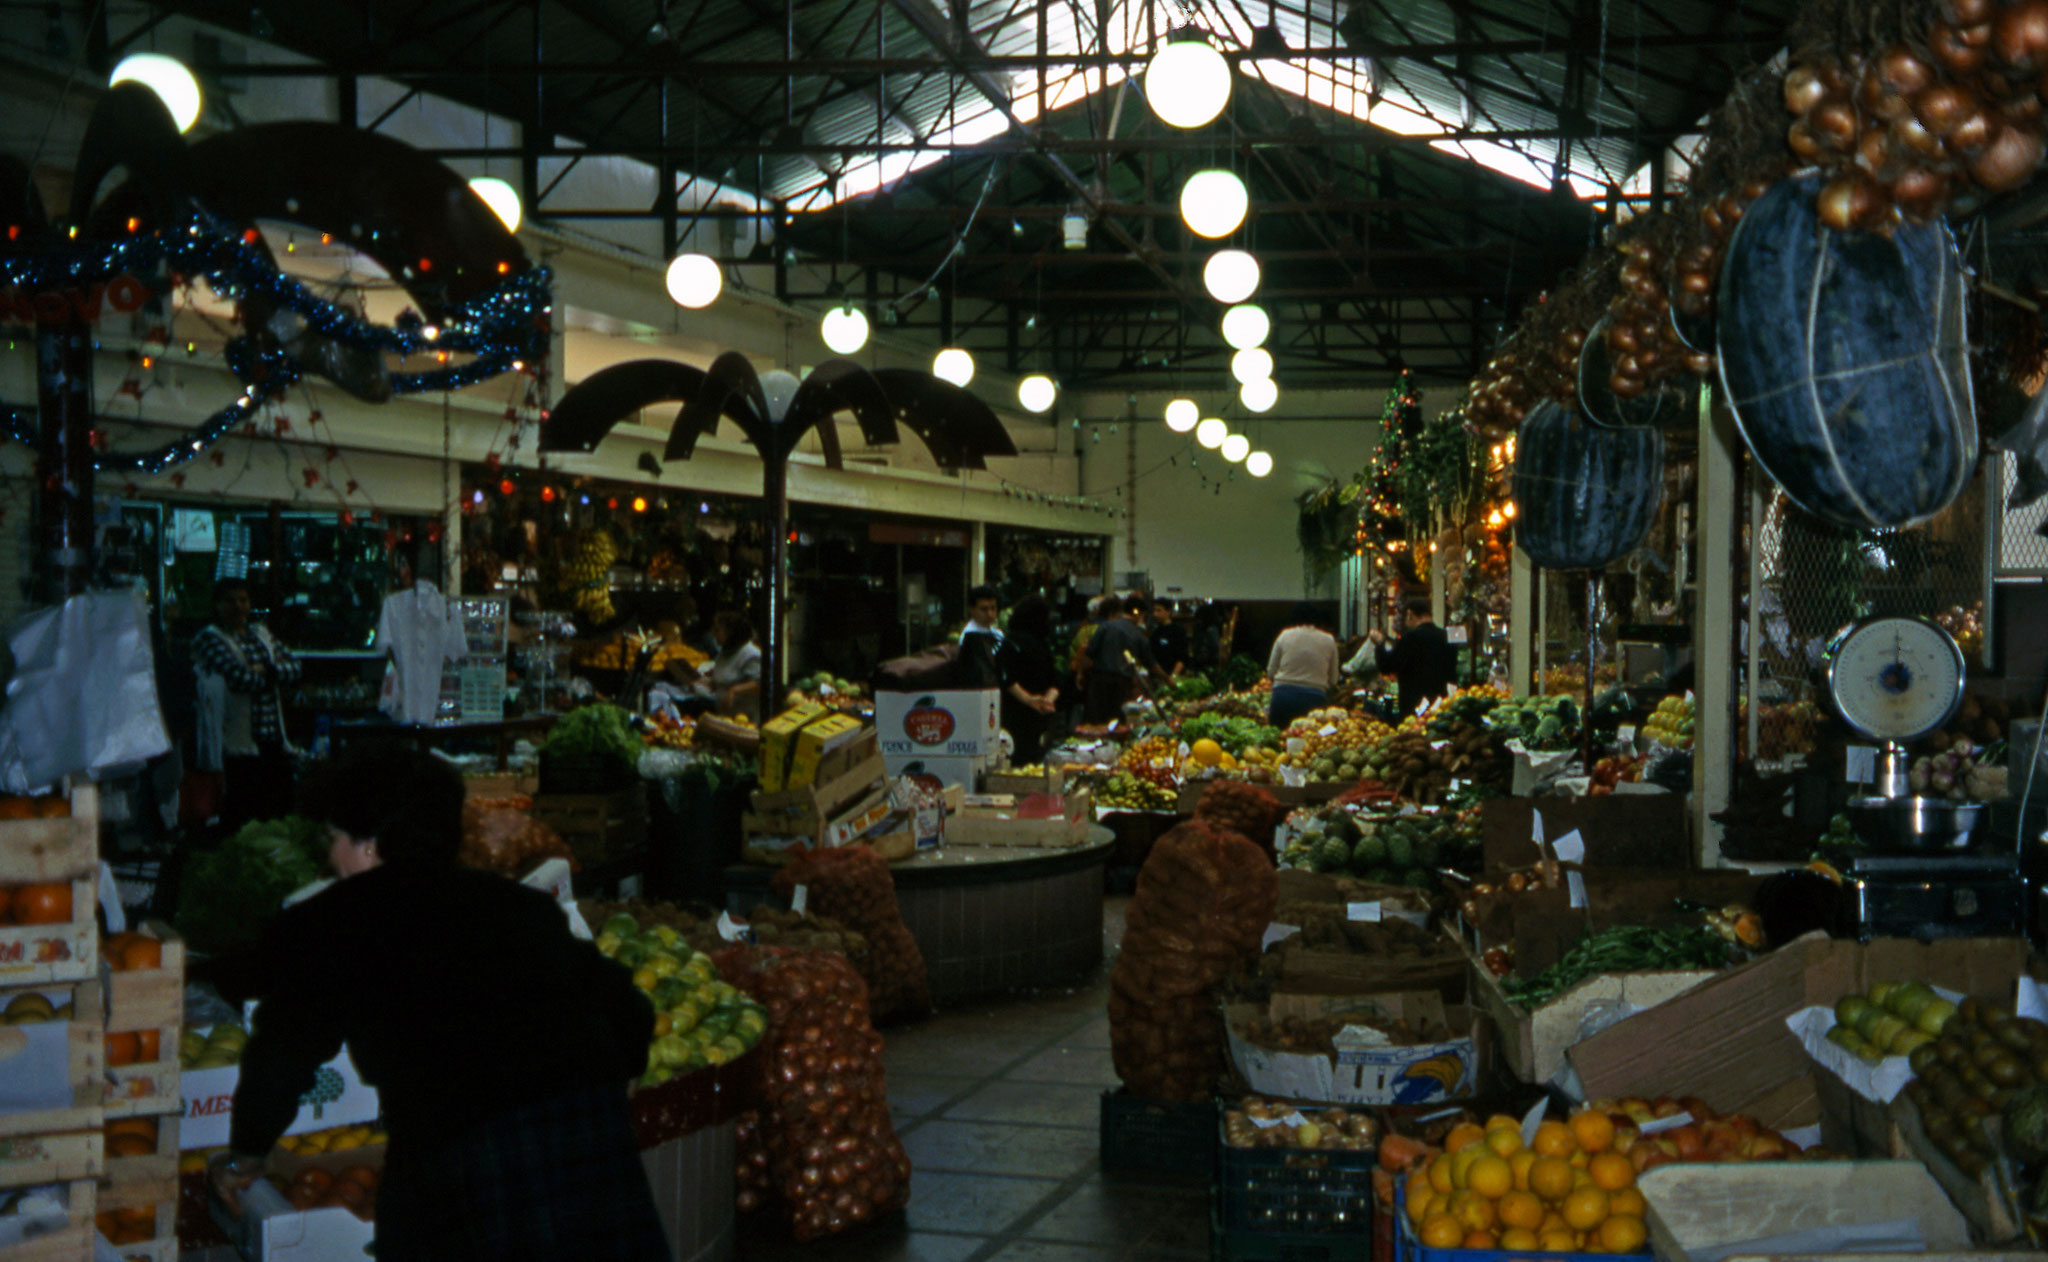 Mercado in Funchal